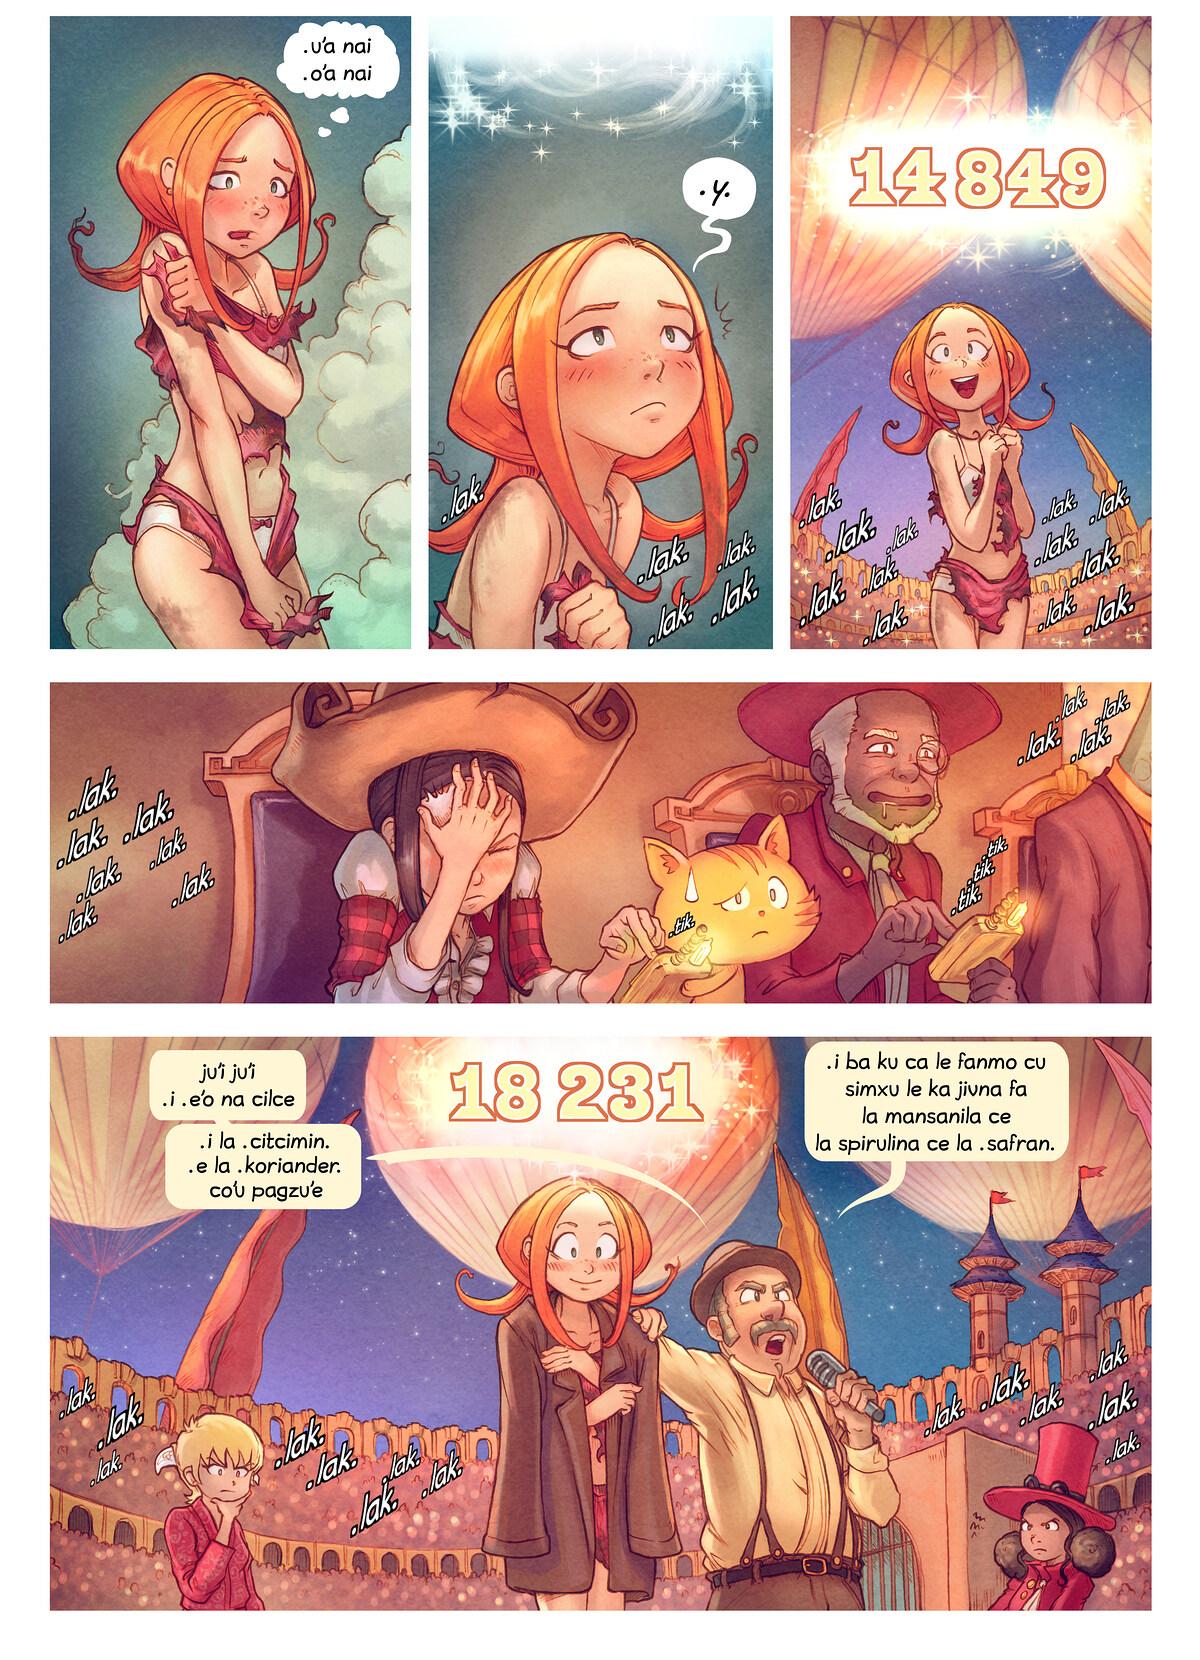 A webcomic page of Pepper&Carrot, pagbu 22 [jb], papri 9